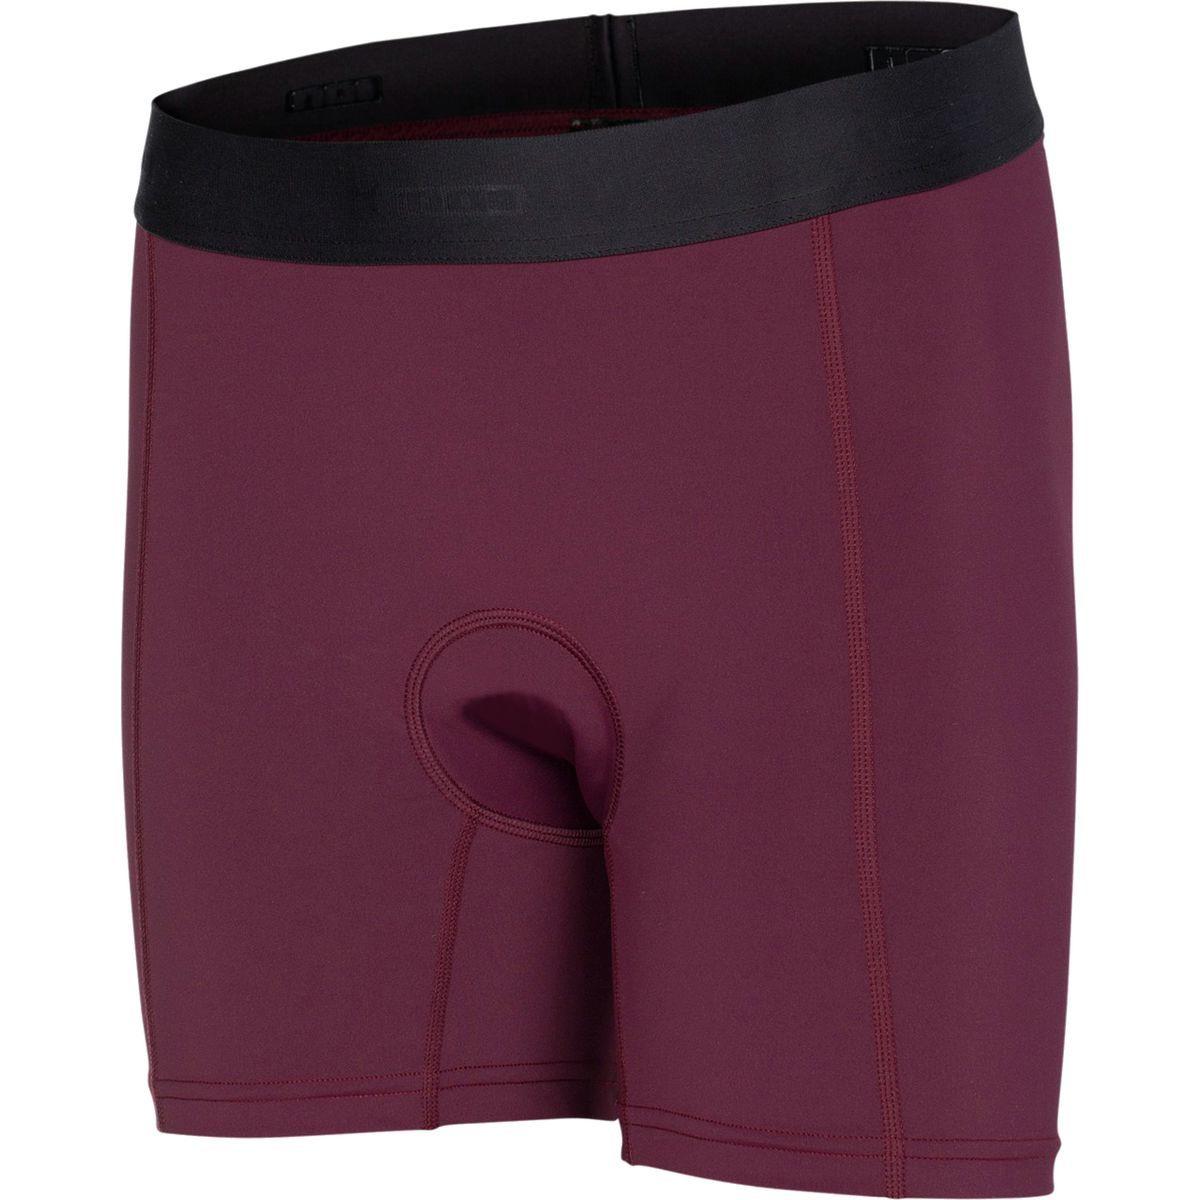 ION Short IN Short - Women's